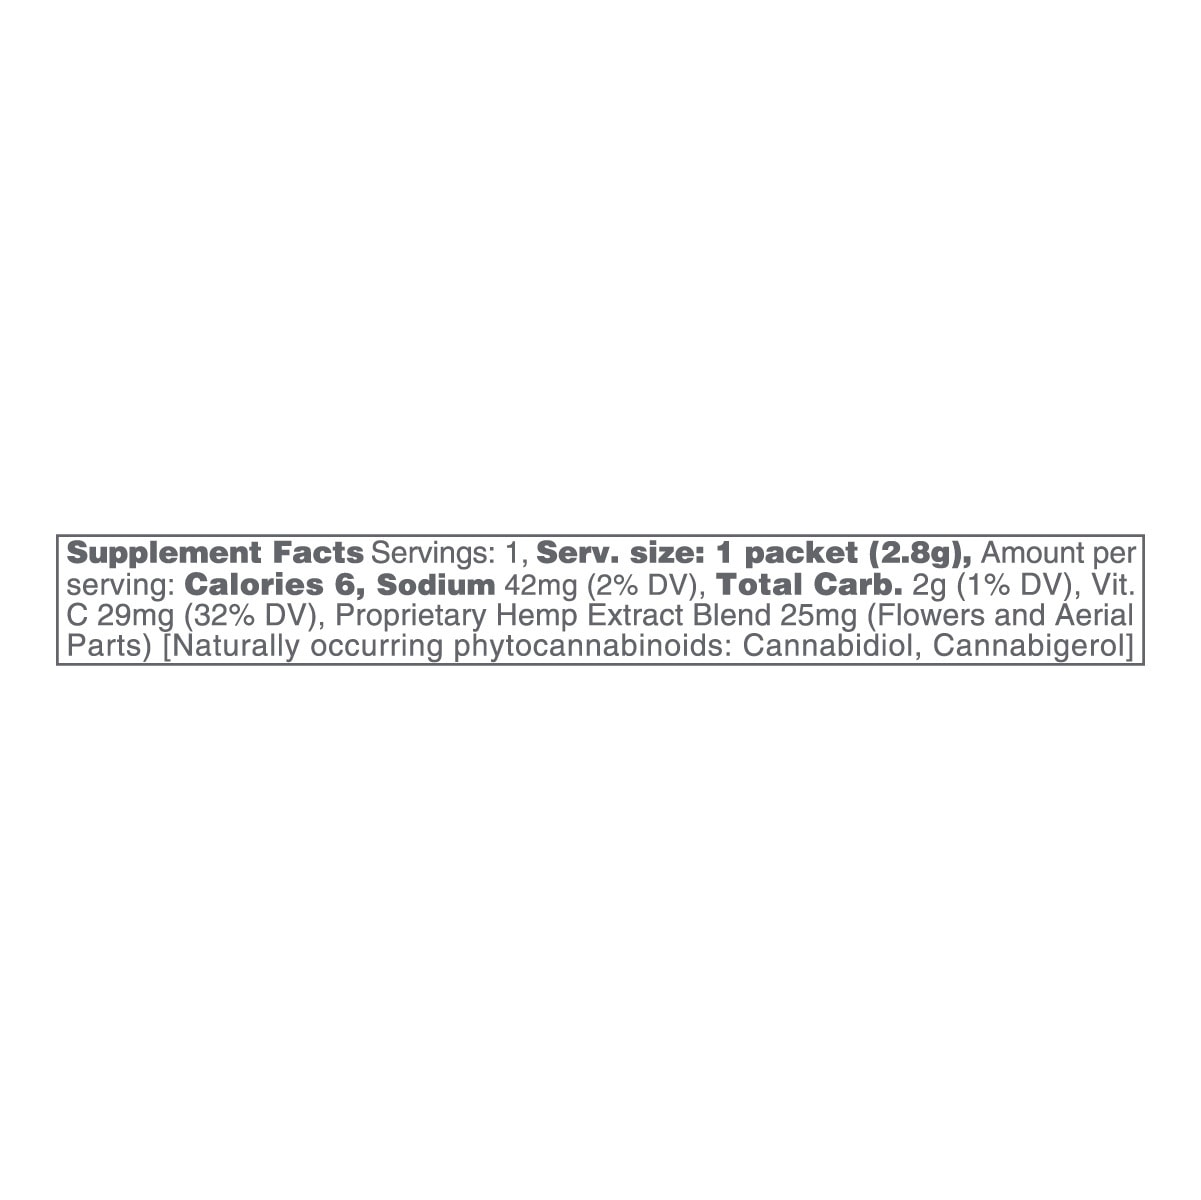 cbdMD, CBD Powdered Drink Mix, Broad Spectrum THC-Free, Fruit Punch, 10ct, 250mg CBD 2